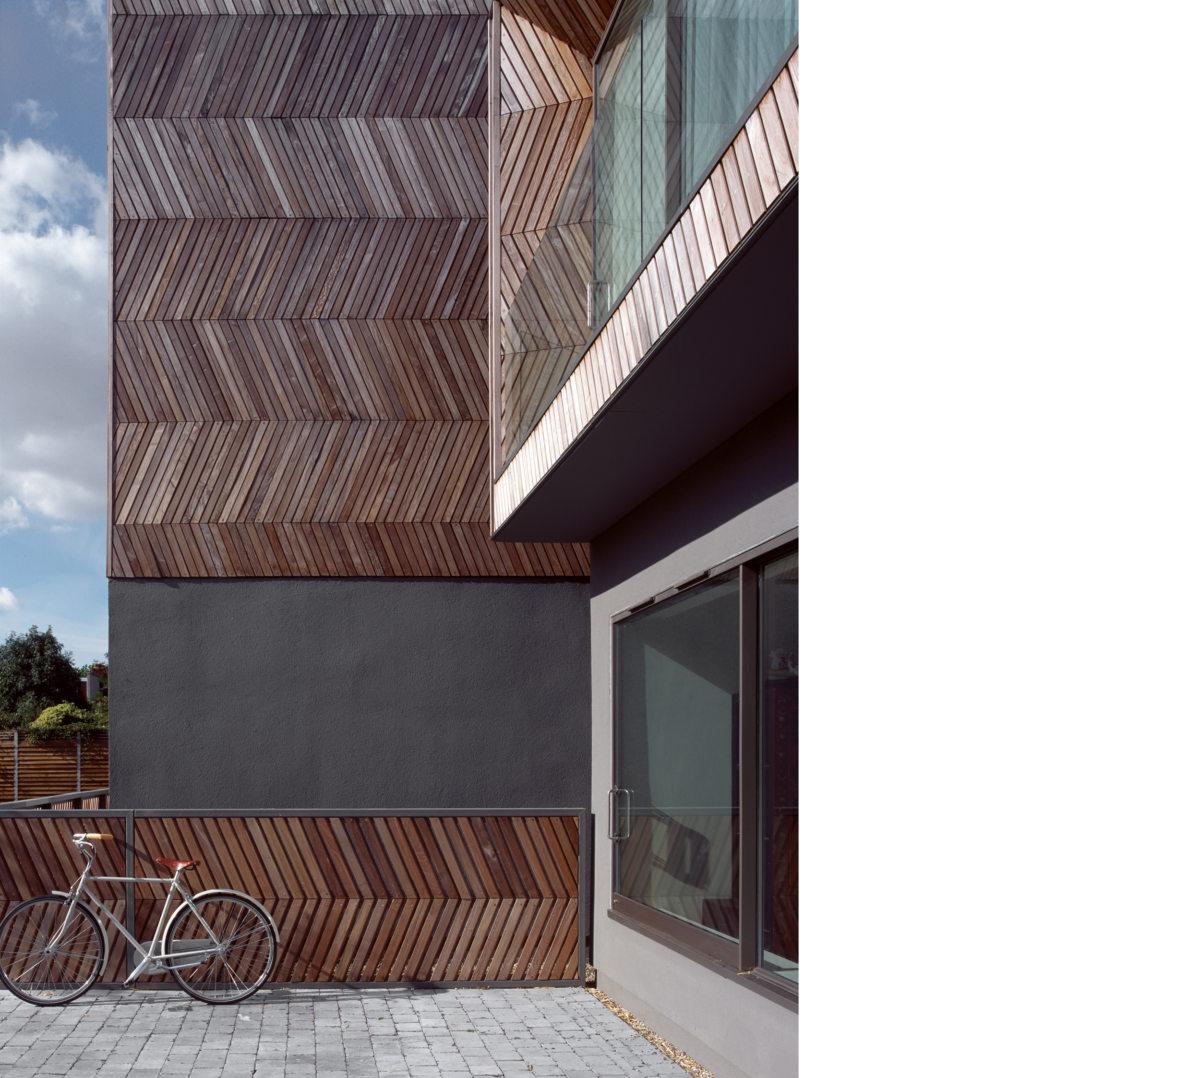 Alison Brooks Architects _ Herringbone Houses _ Photo Exterior Front Oblique